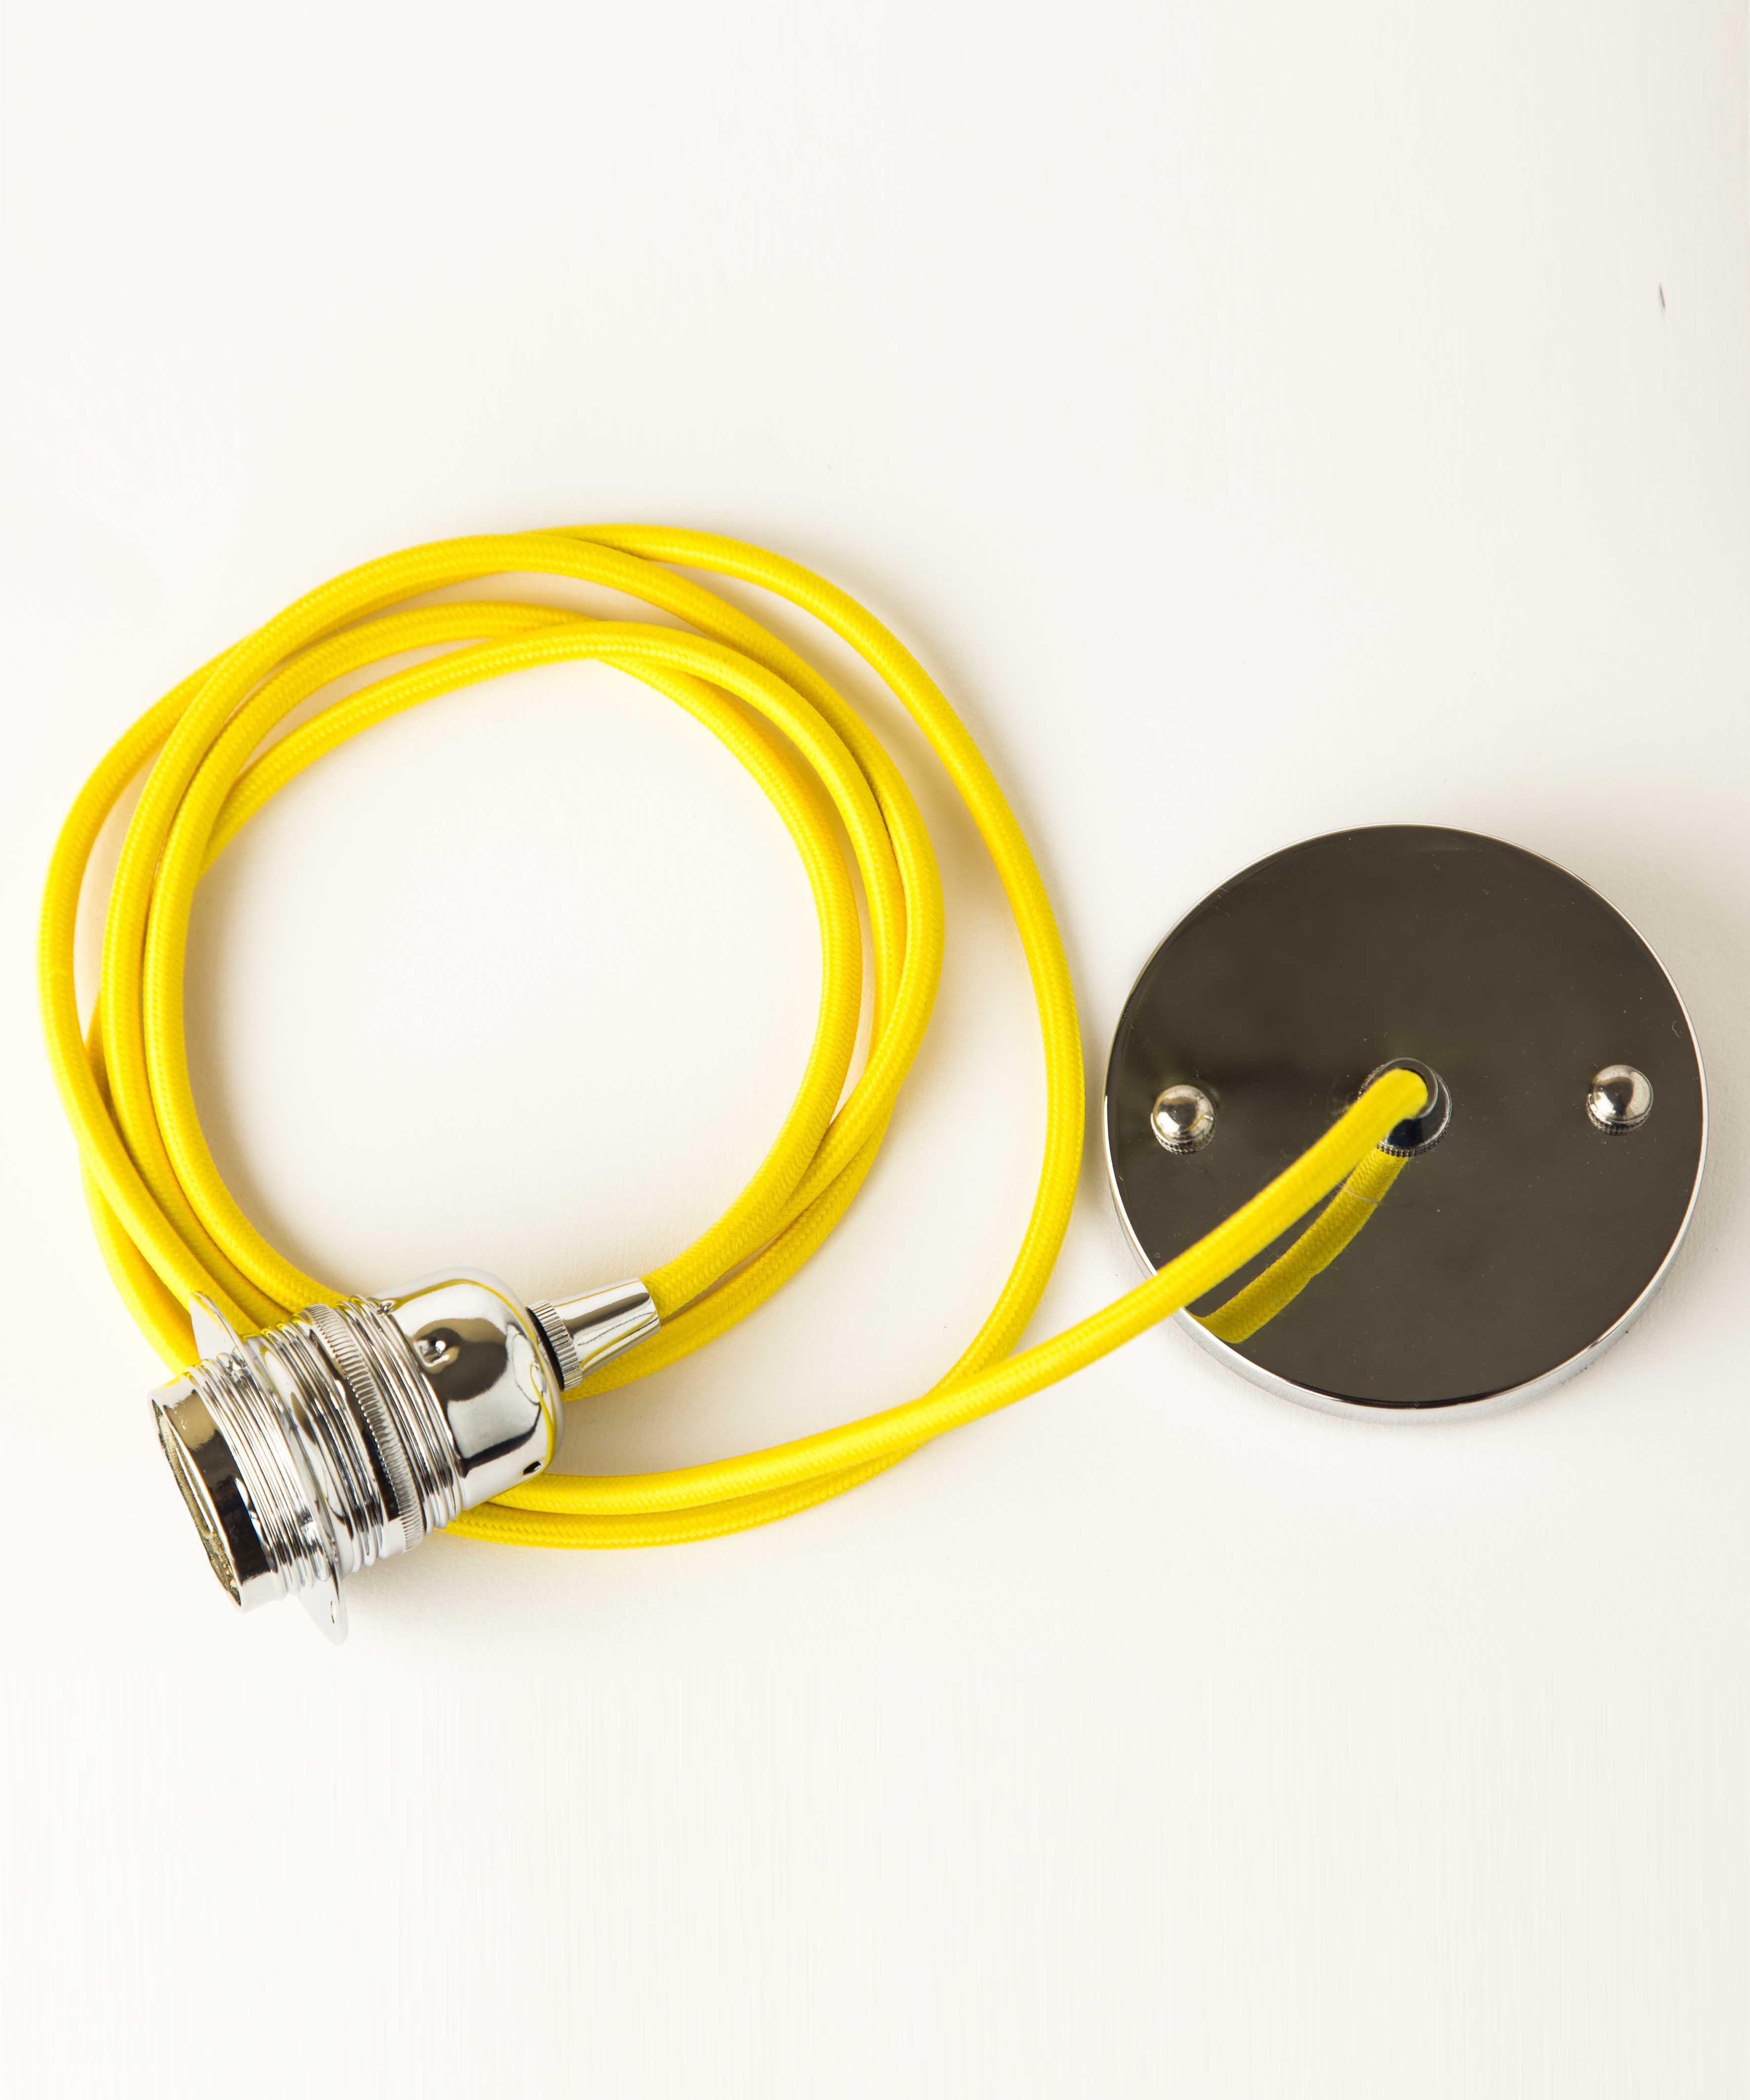 Teardrop st64 william and watson vintage edison bulb industrial light - Create Your Interior